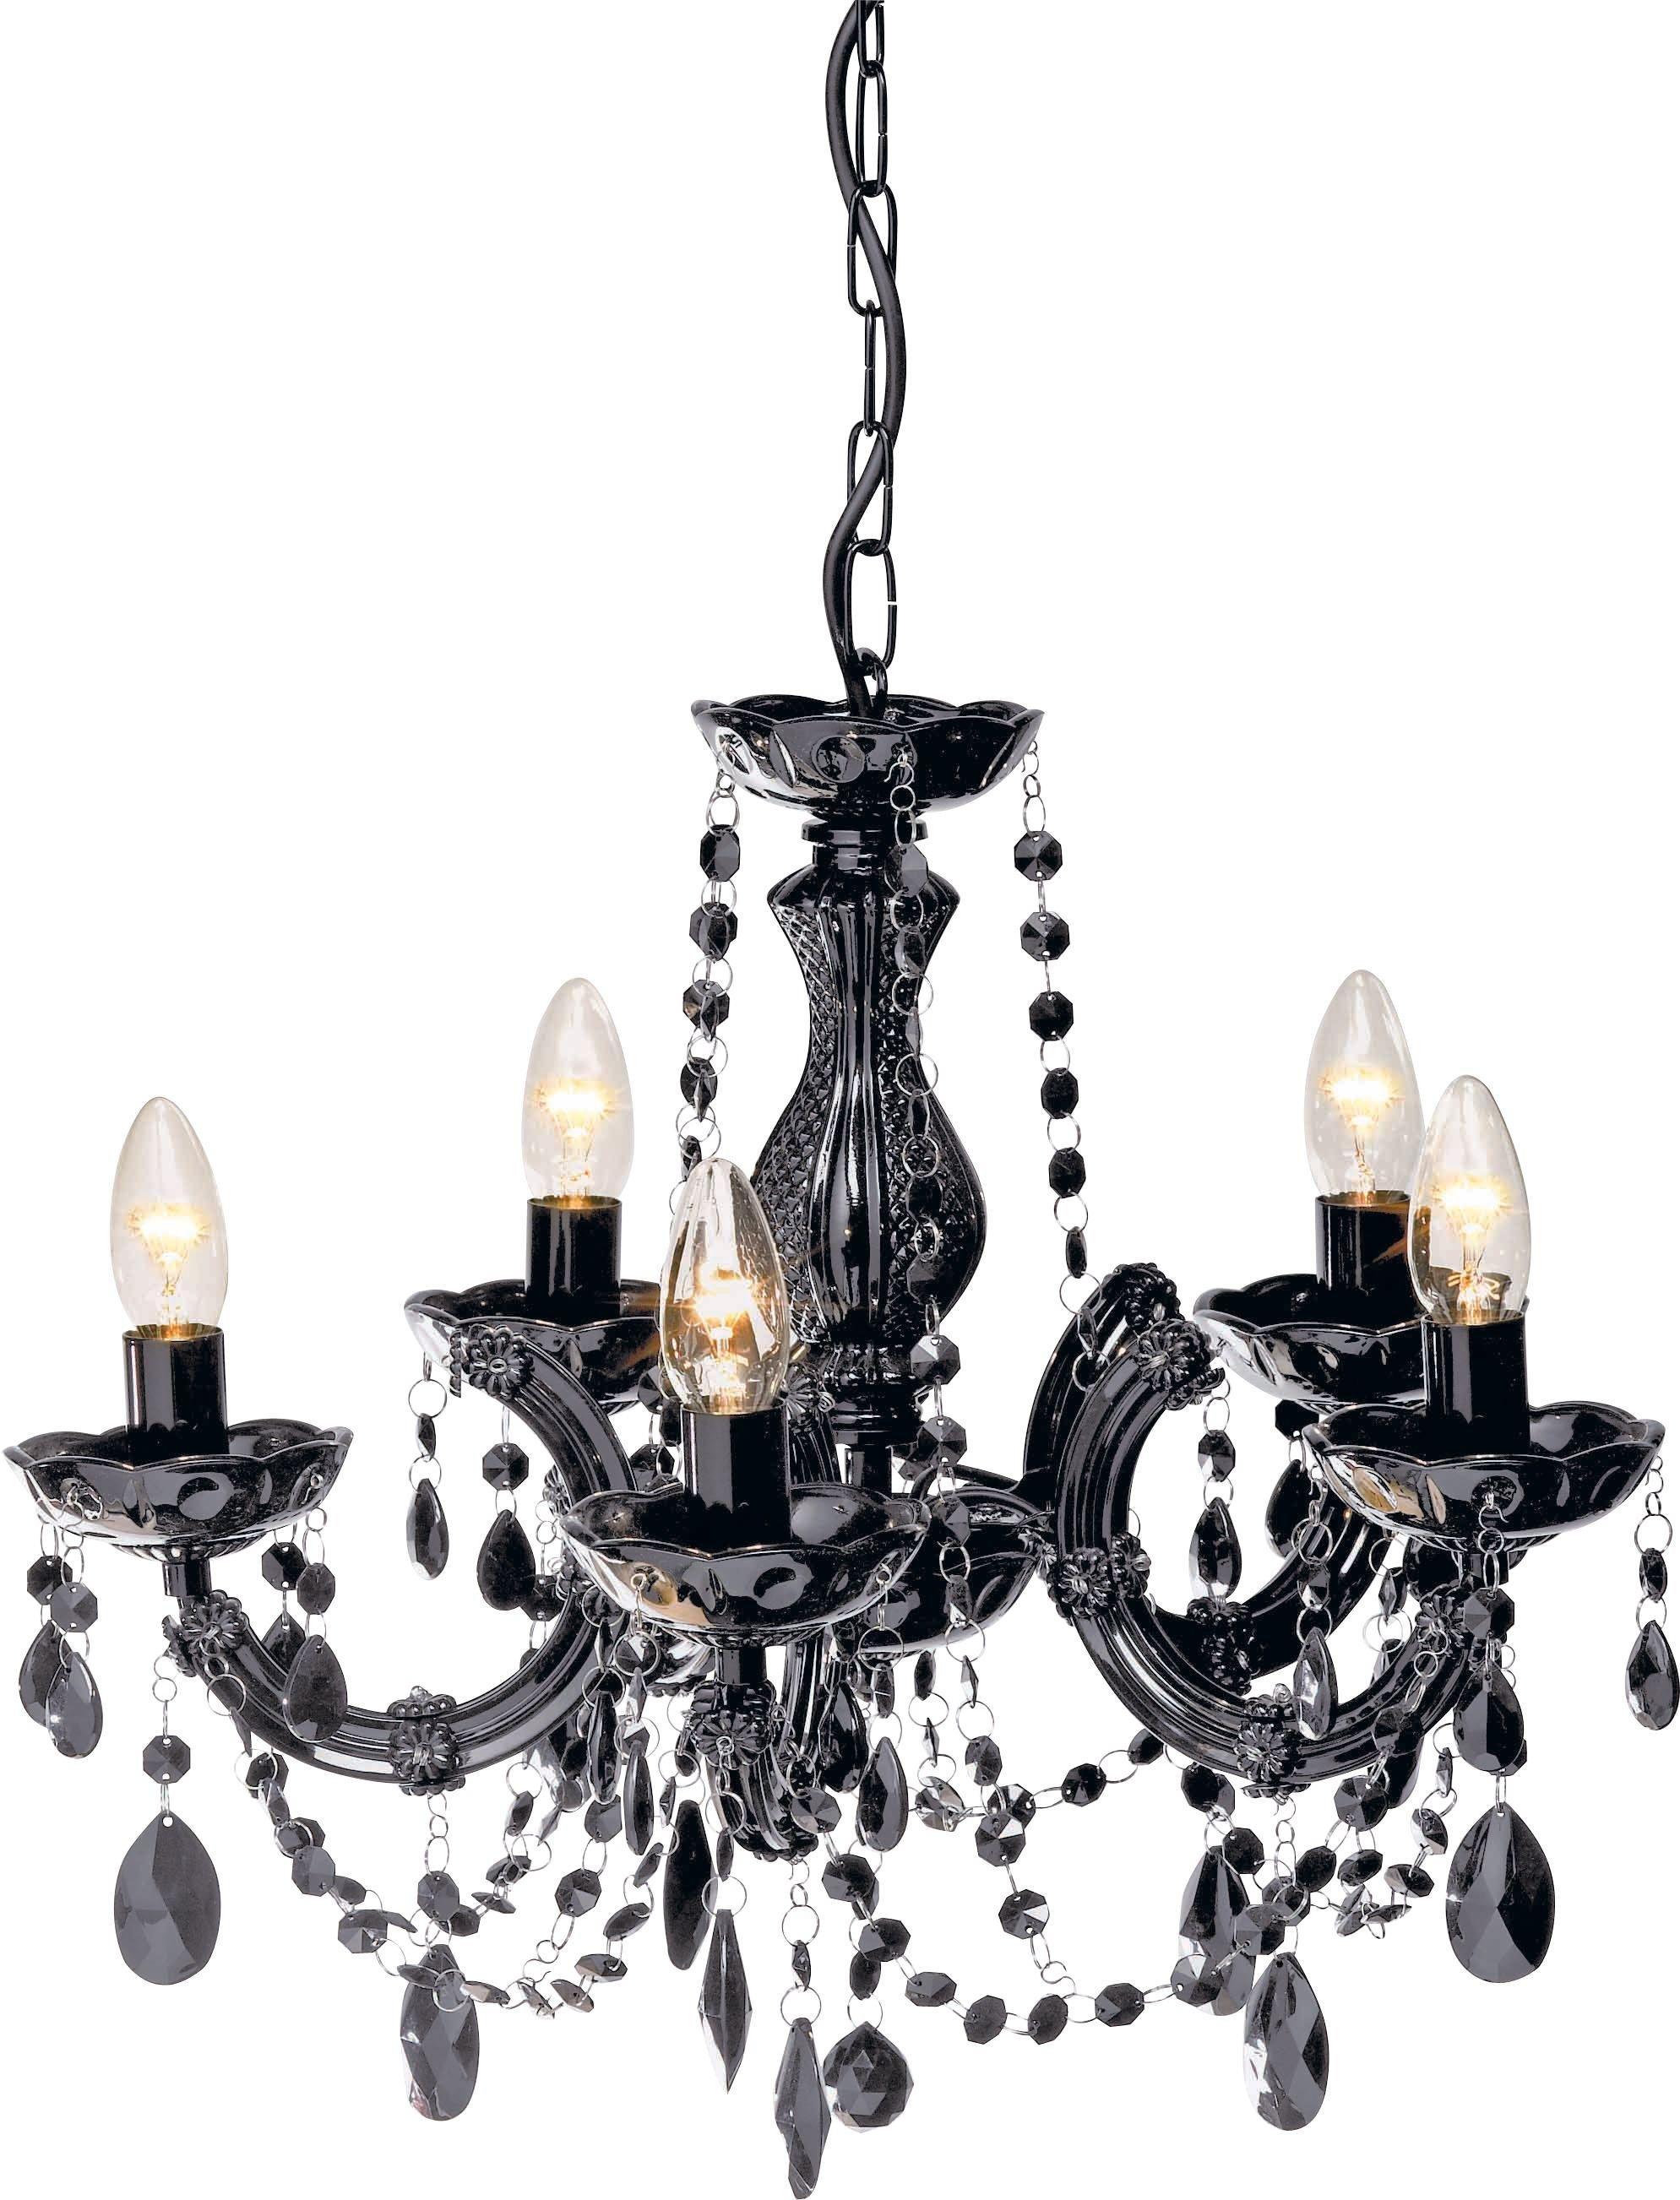 black chandelier lighting photo 5. collection inspire 5 light chandelier ceiling fitting blk black lighting photo t